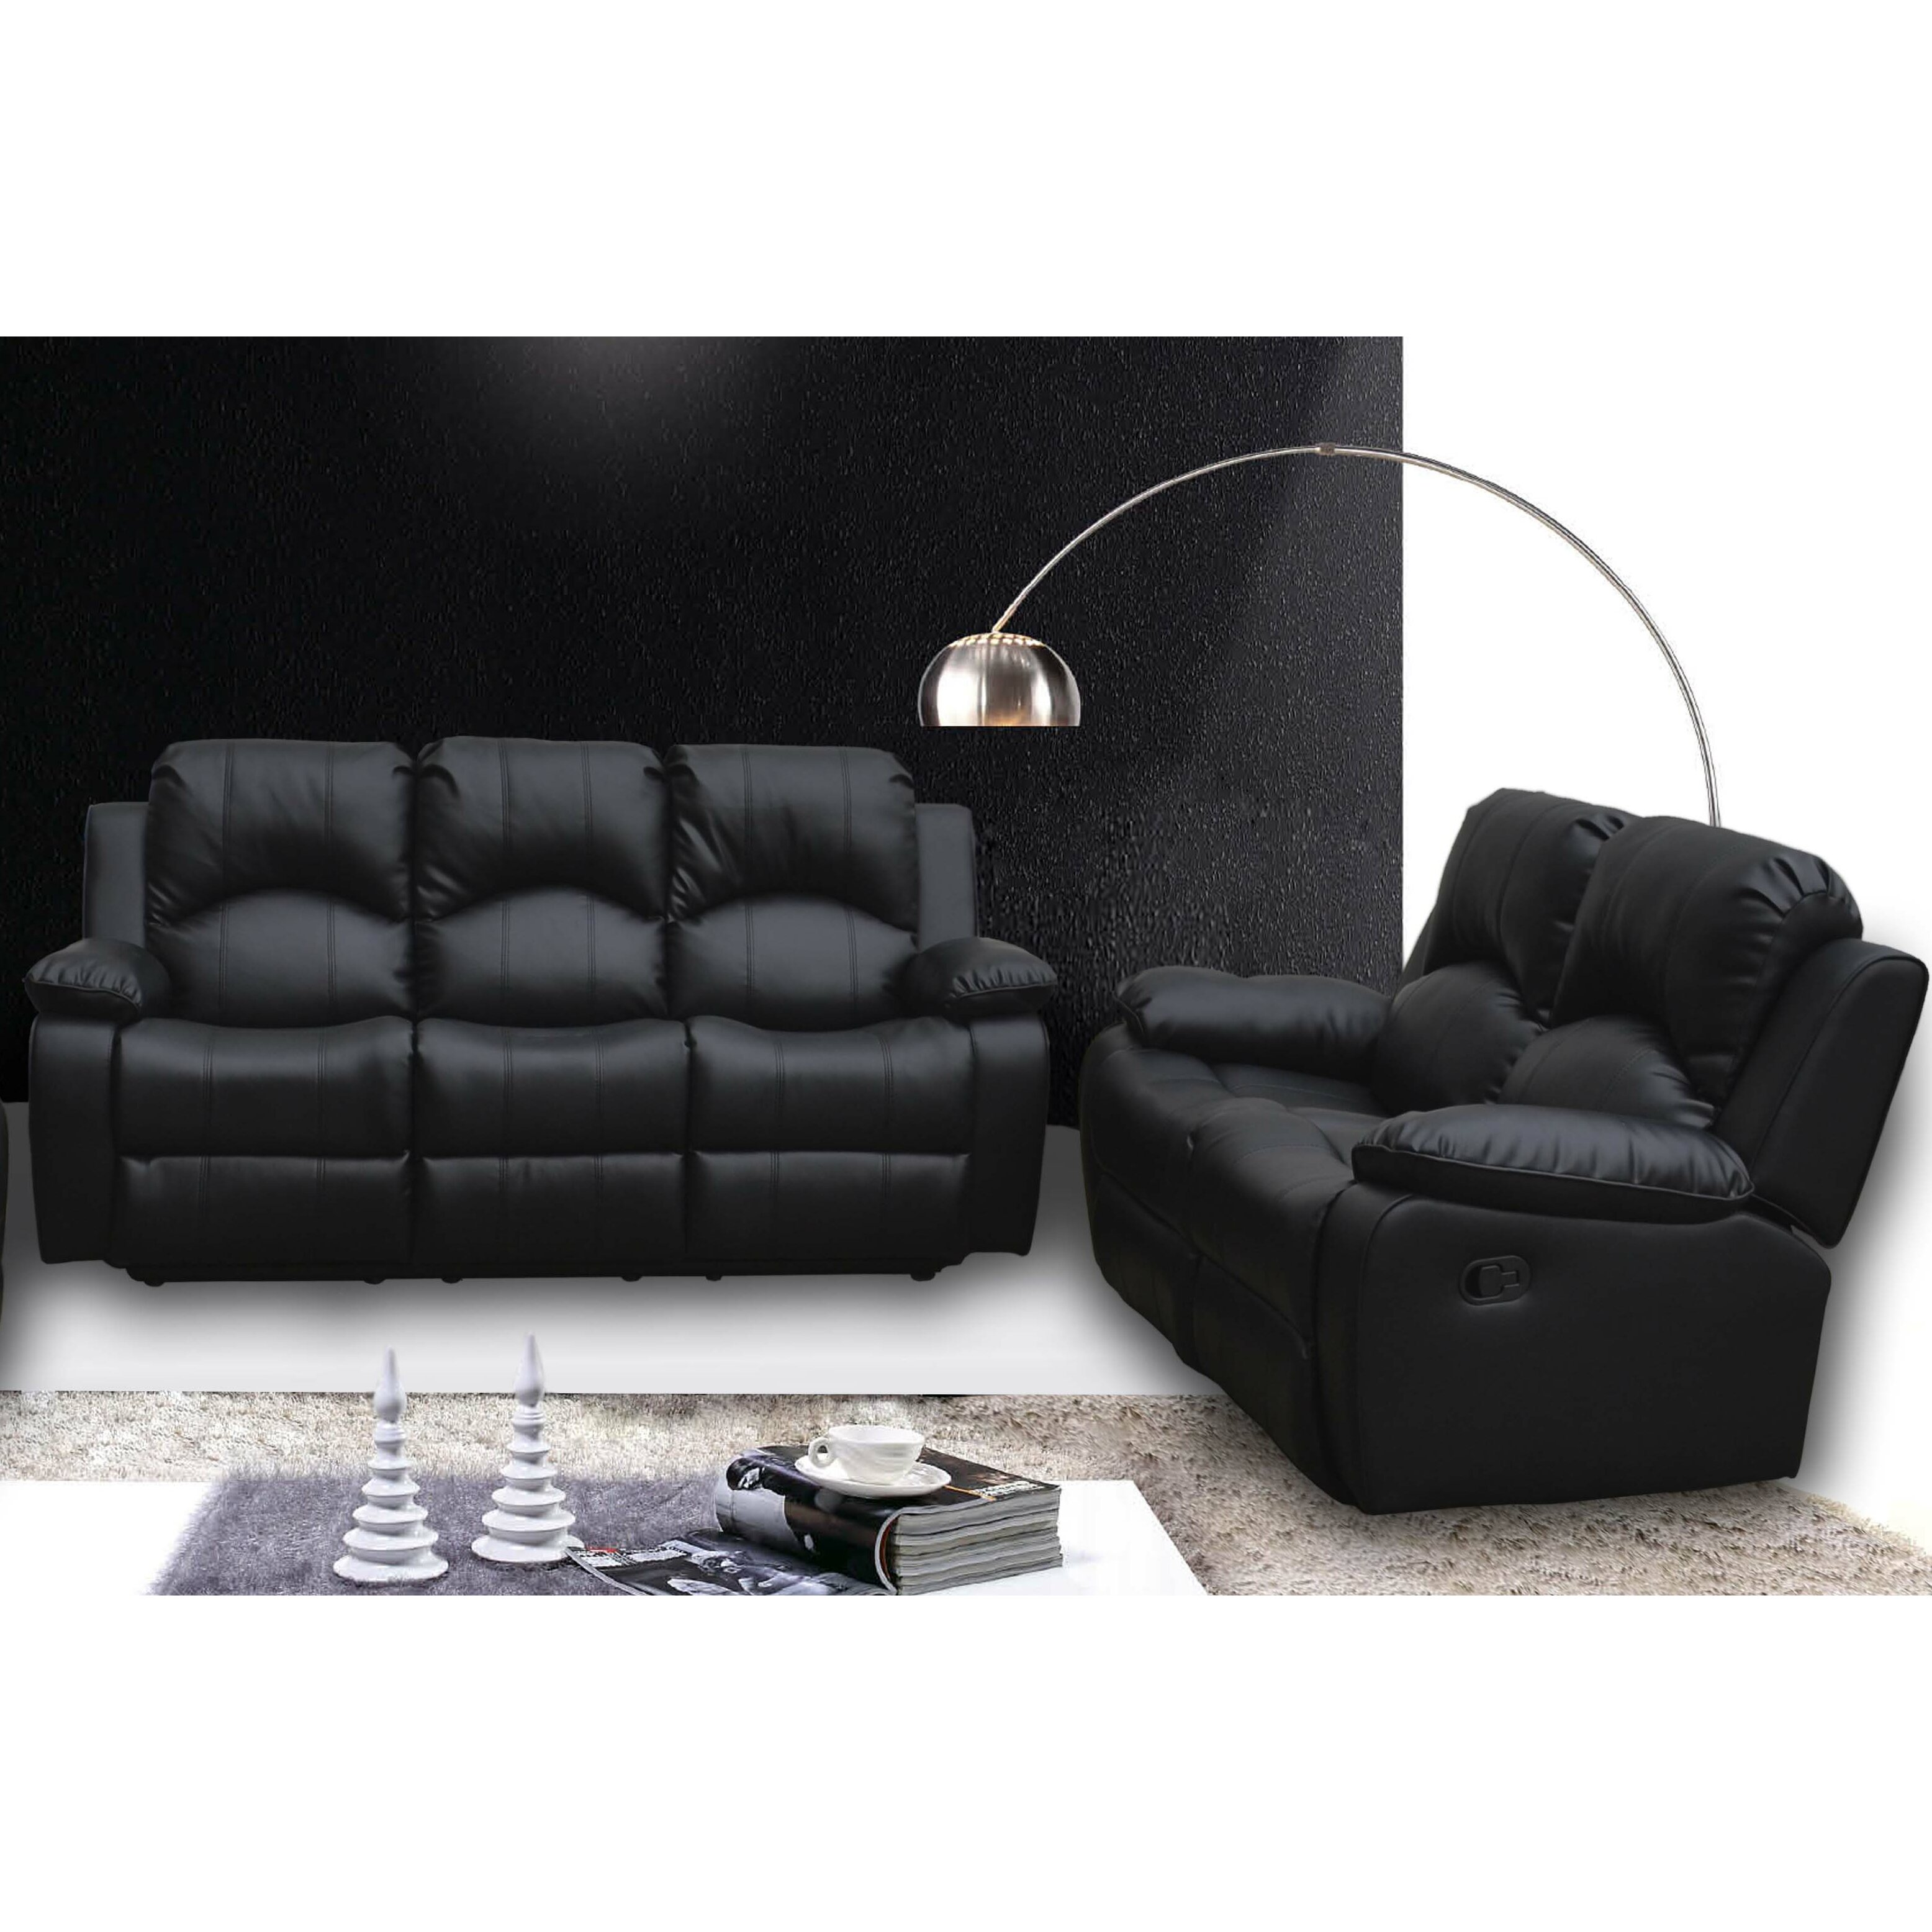 trends interiors antonio sofa set reviews. Black Bedroom Furniture Sets. Home Design Ideas